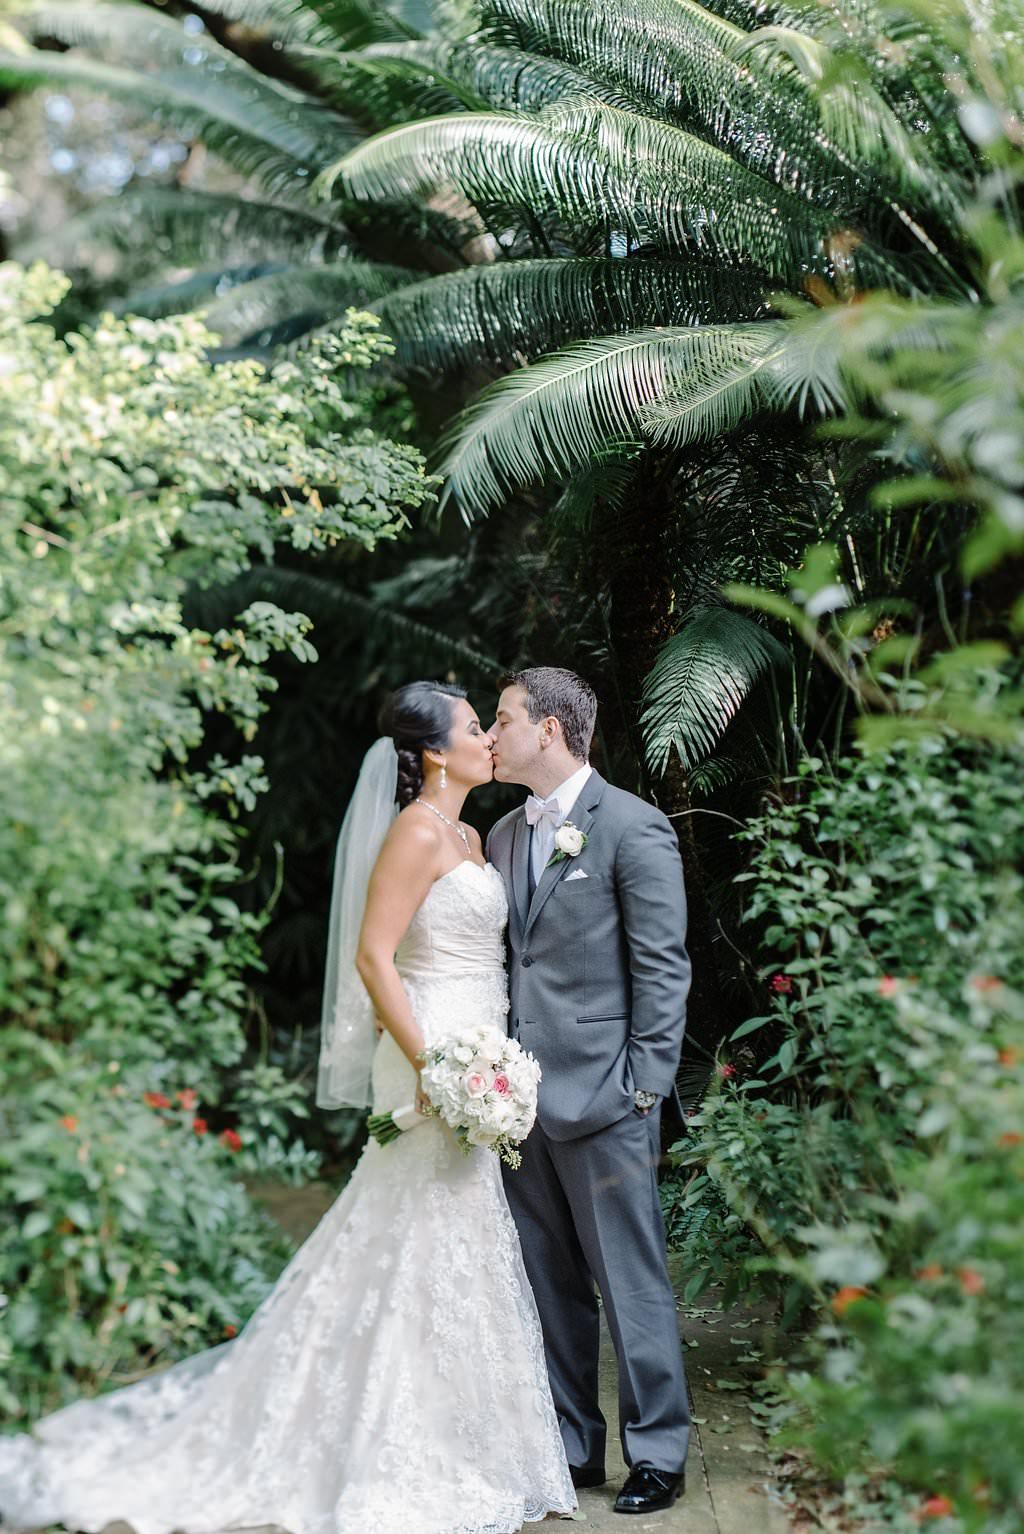 Outdoor Tropical Garden Bride and Groom Wedding Portrait, Bride in Strapless Lace Allure Bridal Dress with Comb Veil, Groom in Grey Suit   St Pete Wedding Venue Sunken Gardens